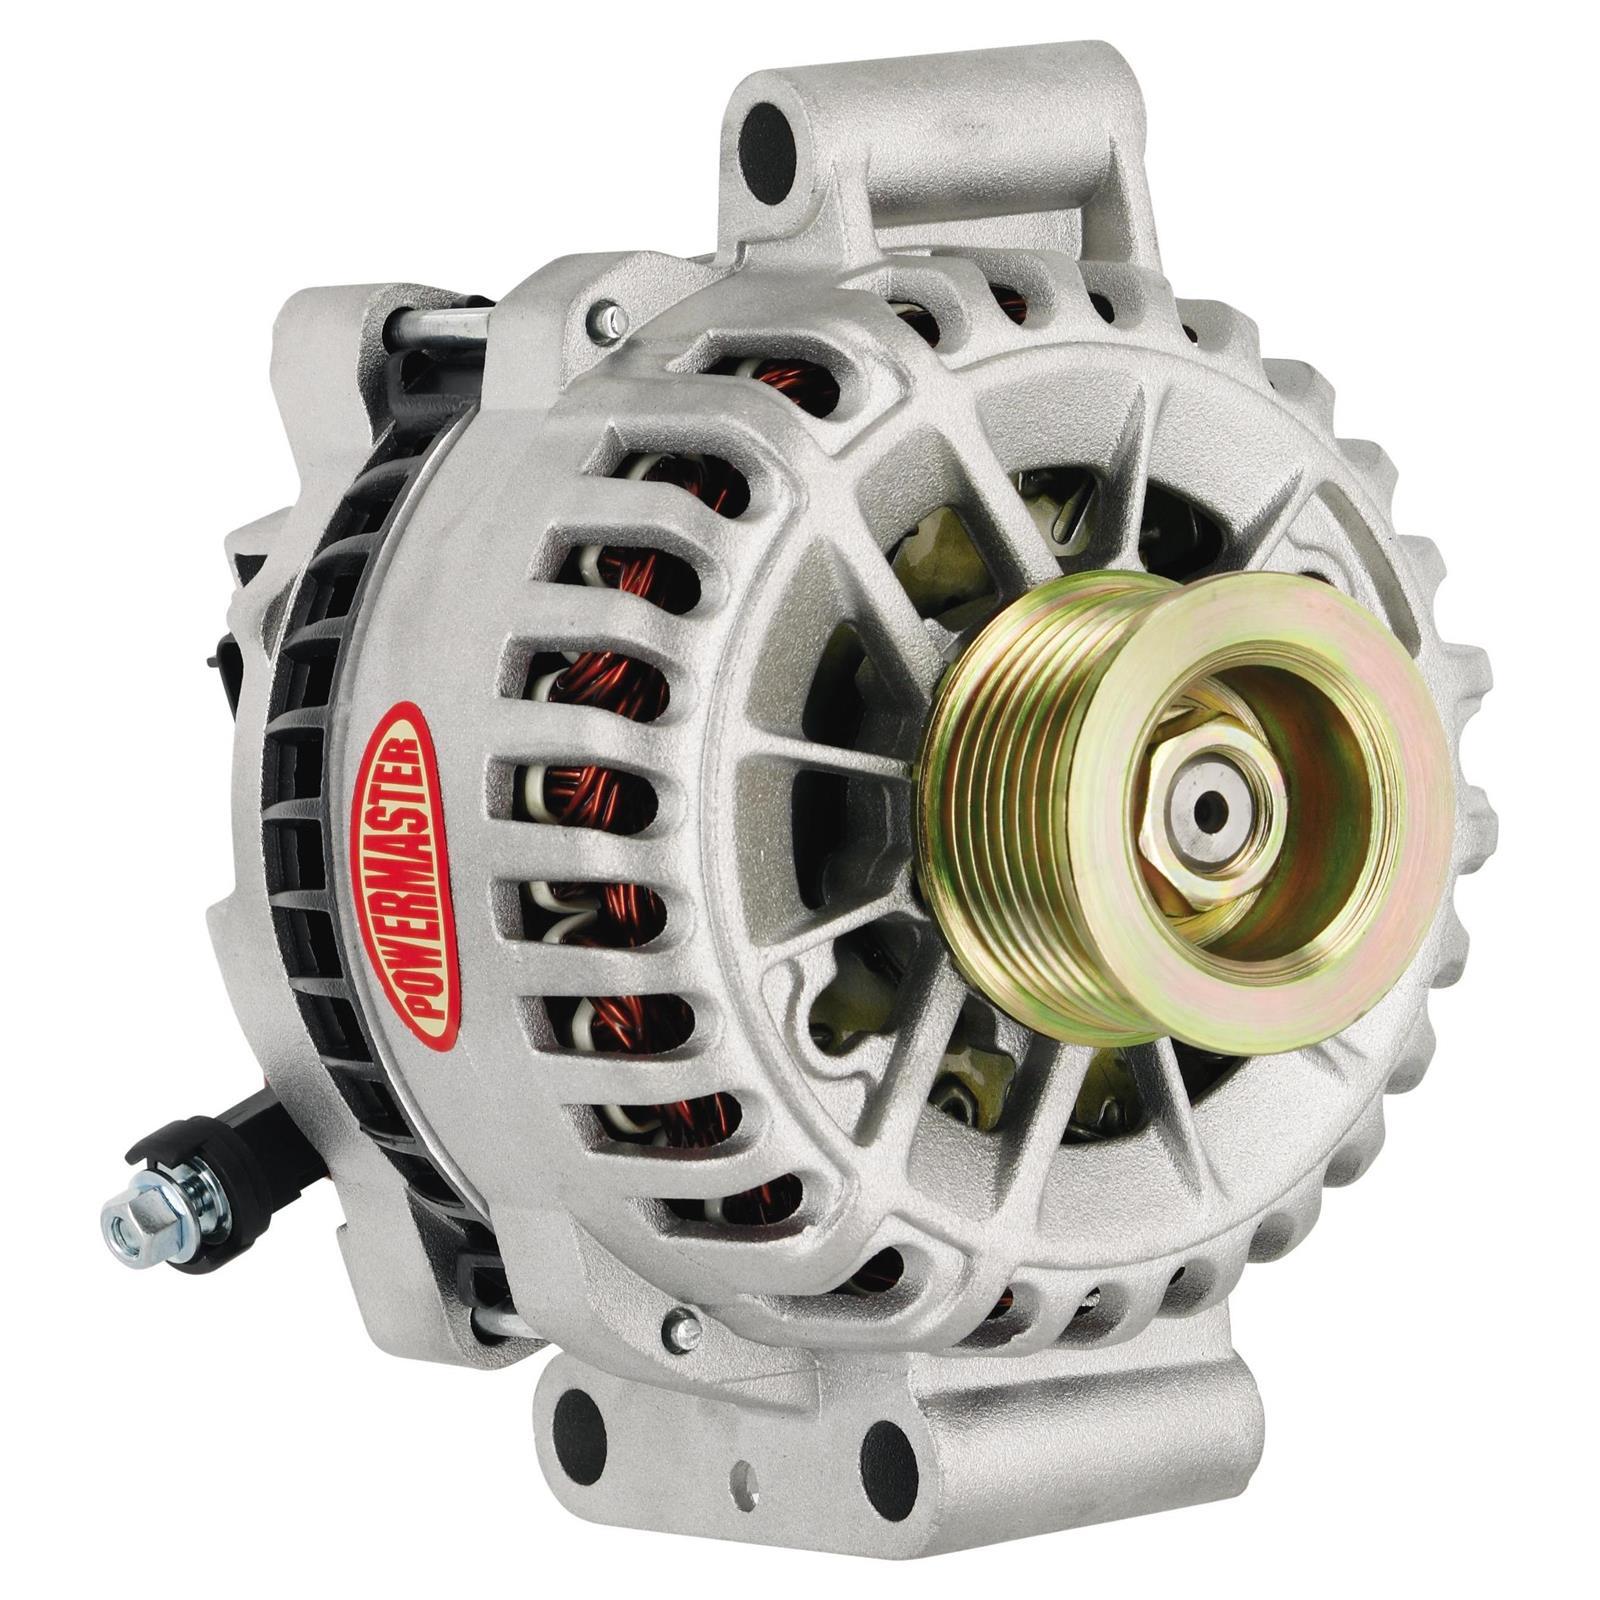 Find Every Shop In The World Selling Powermaster 47294 Alternator At Alternators Chrysler 25548478 48478 692209014096 Race